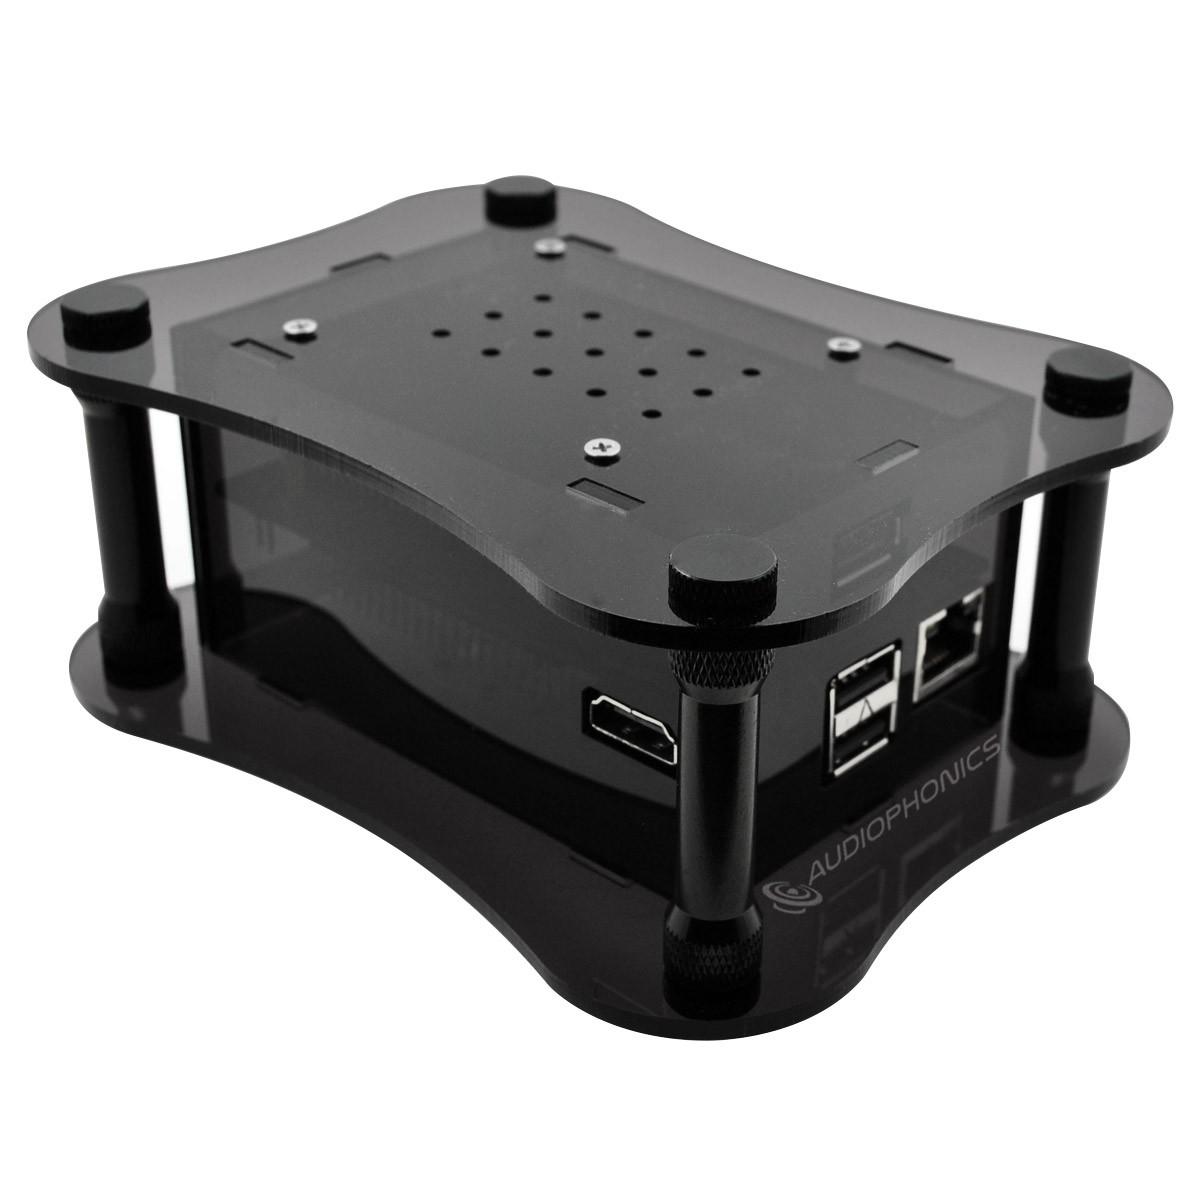 ALLO USBRIDGE Black Acrylic - Audio Streamer Squeezelite Volumio for USB DAC